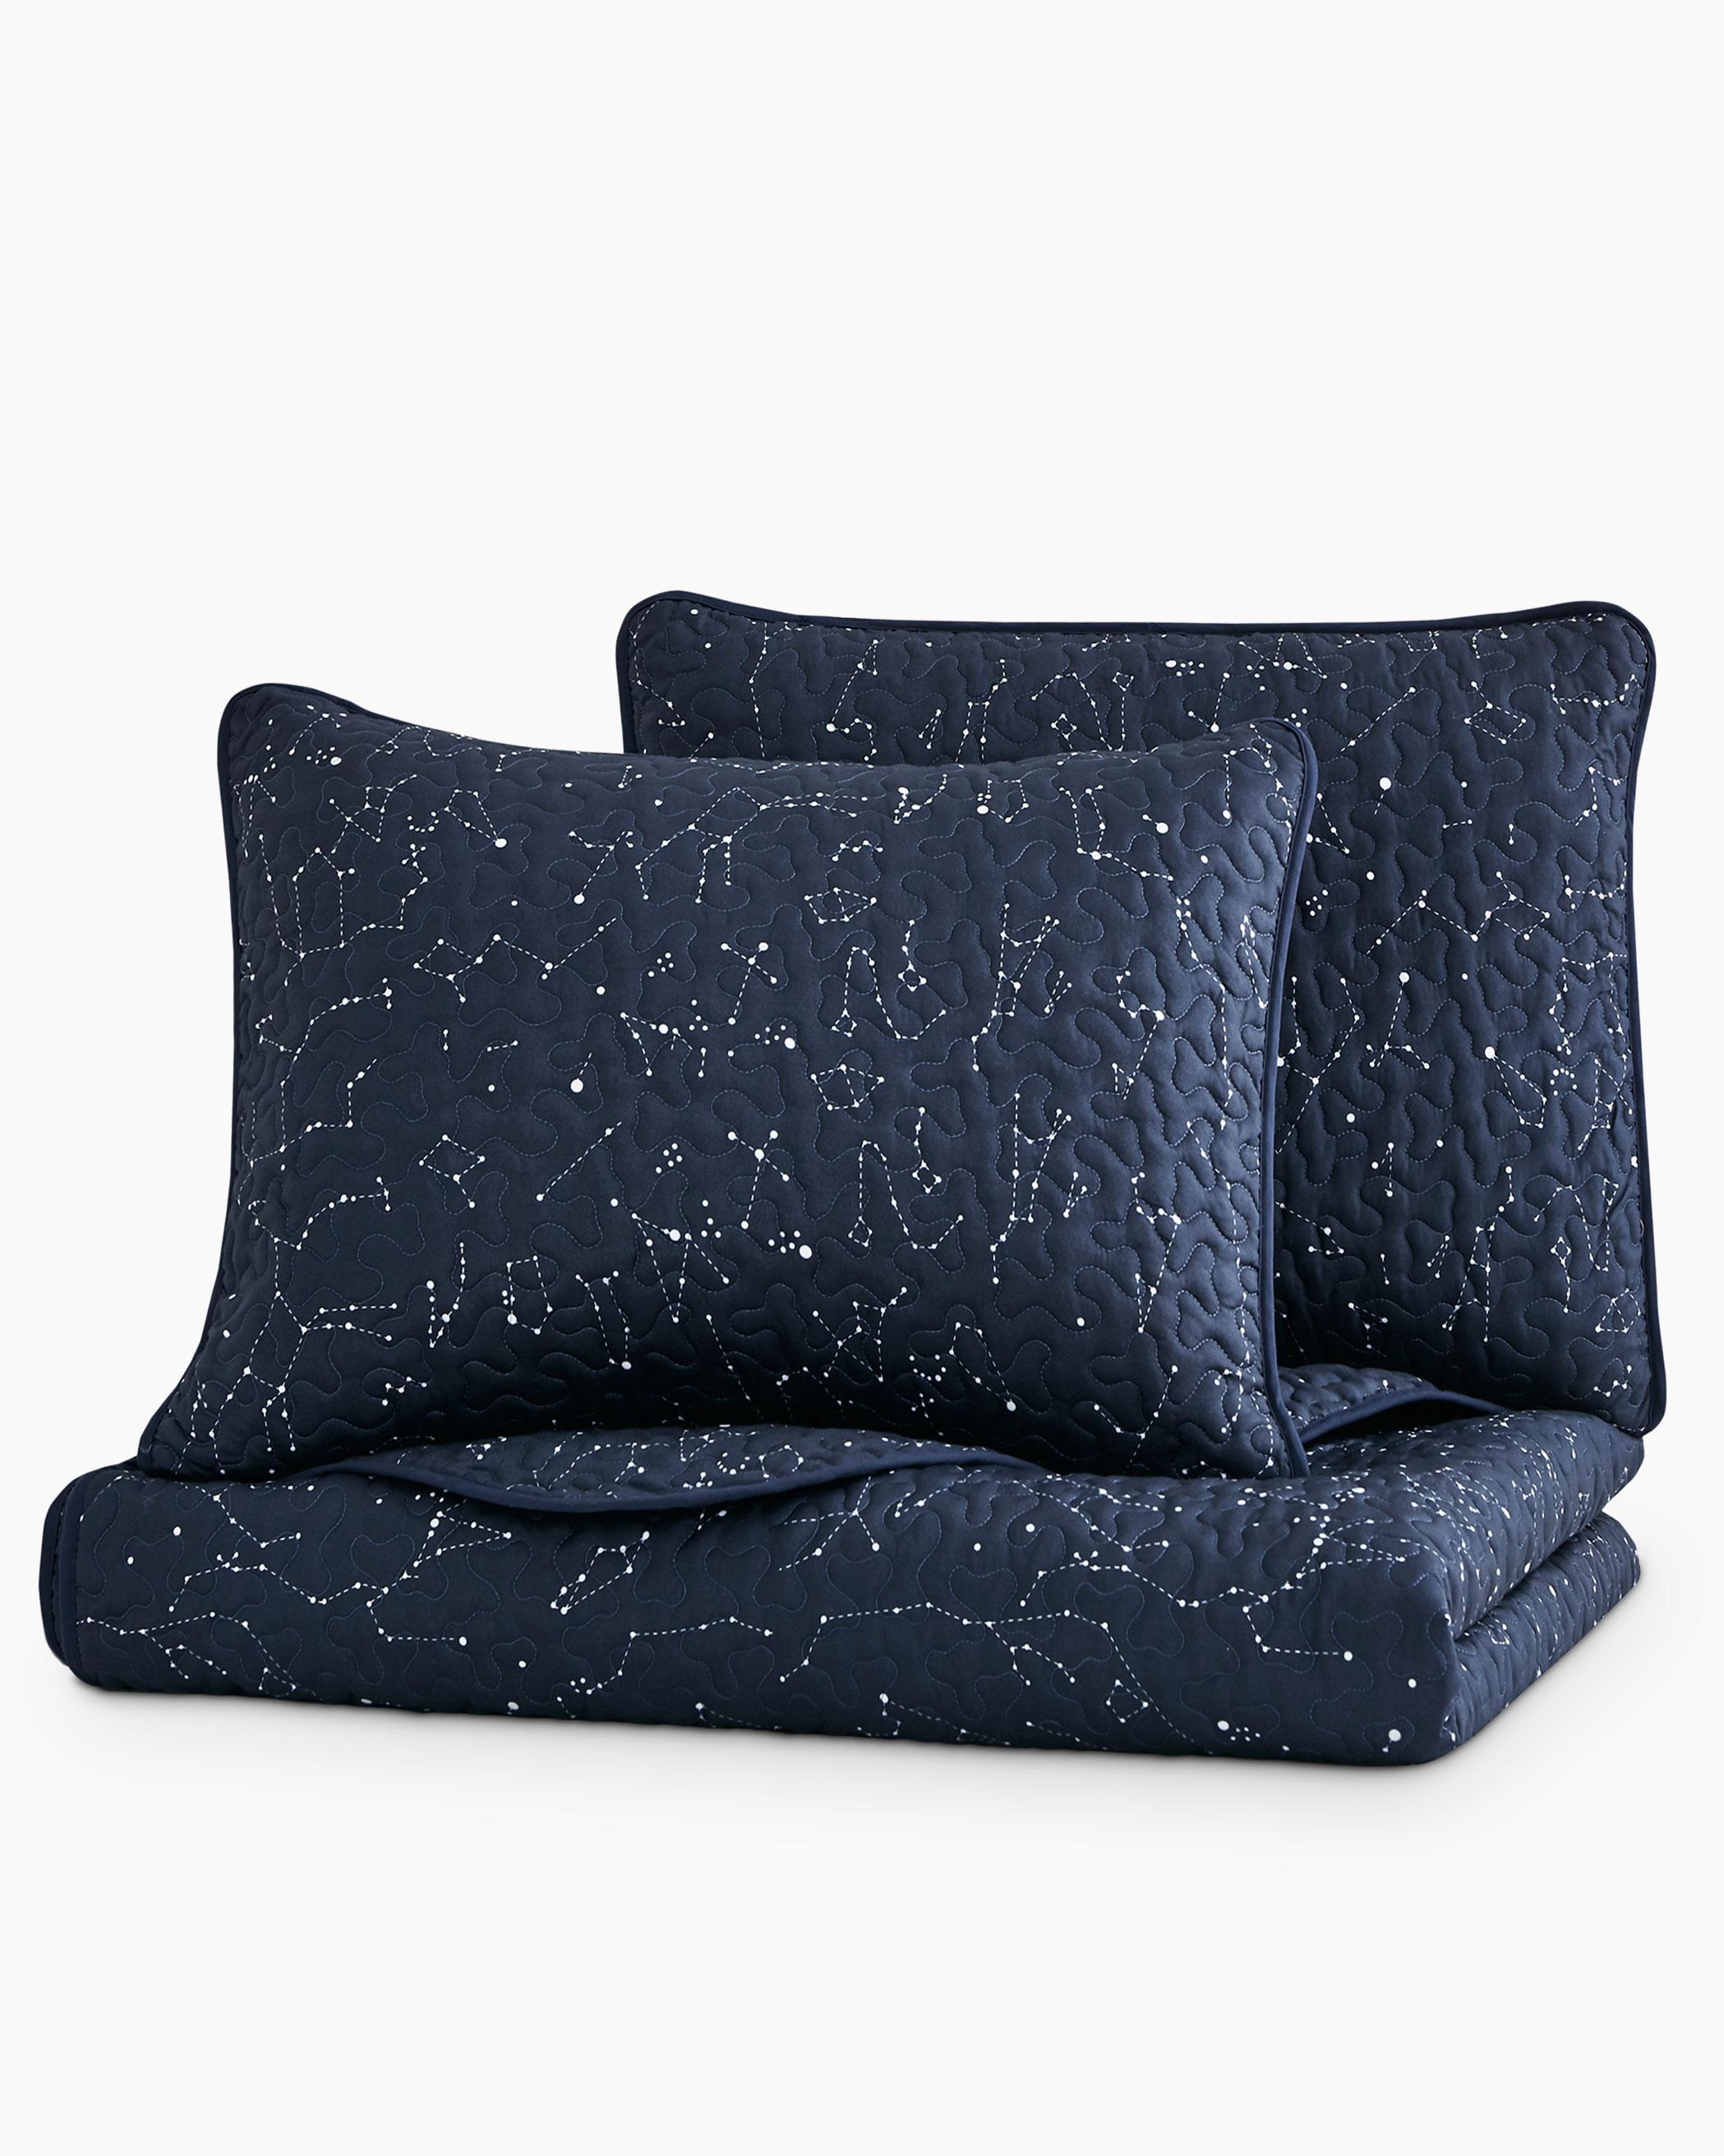 Constellation Microfiber Quilt Set